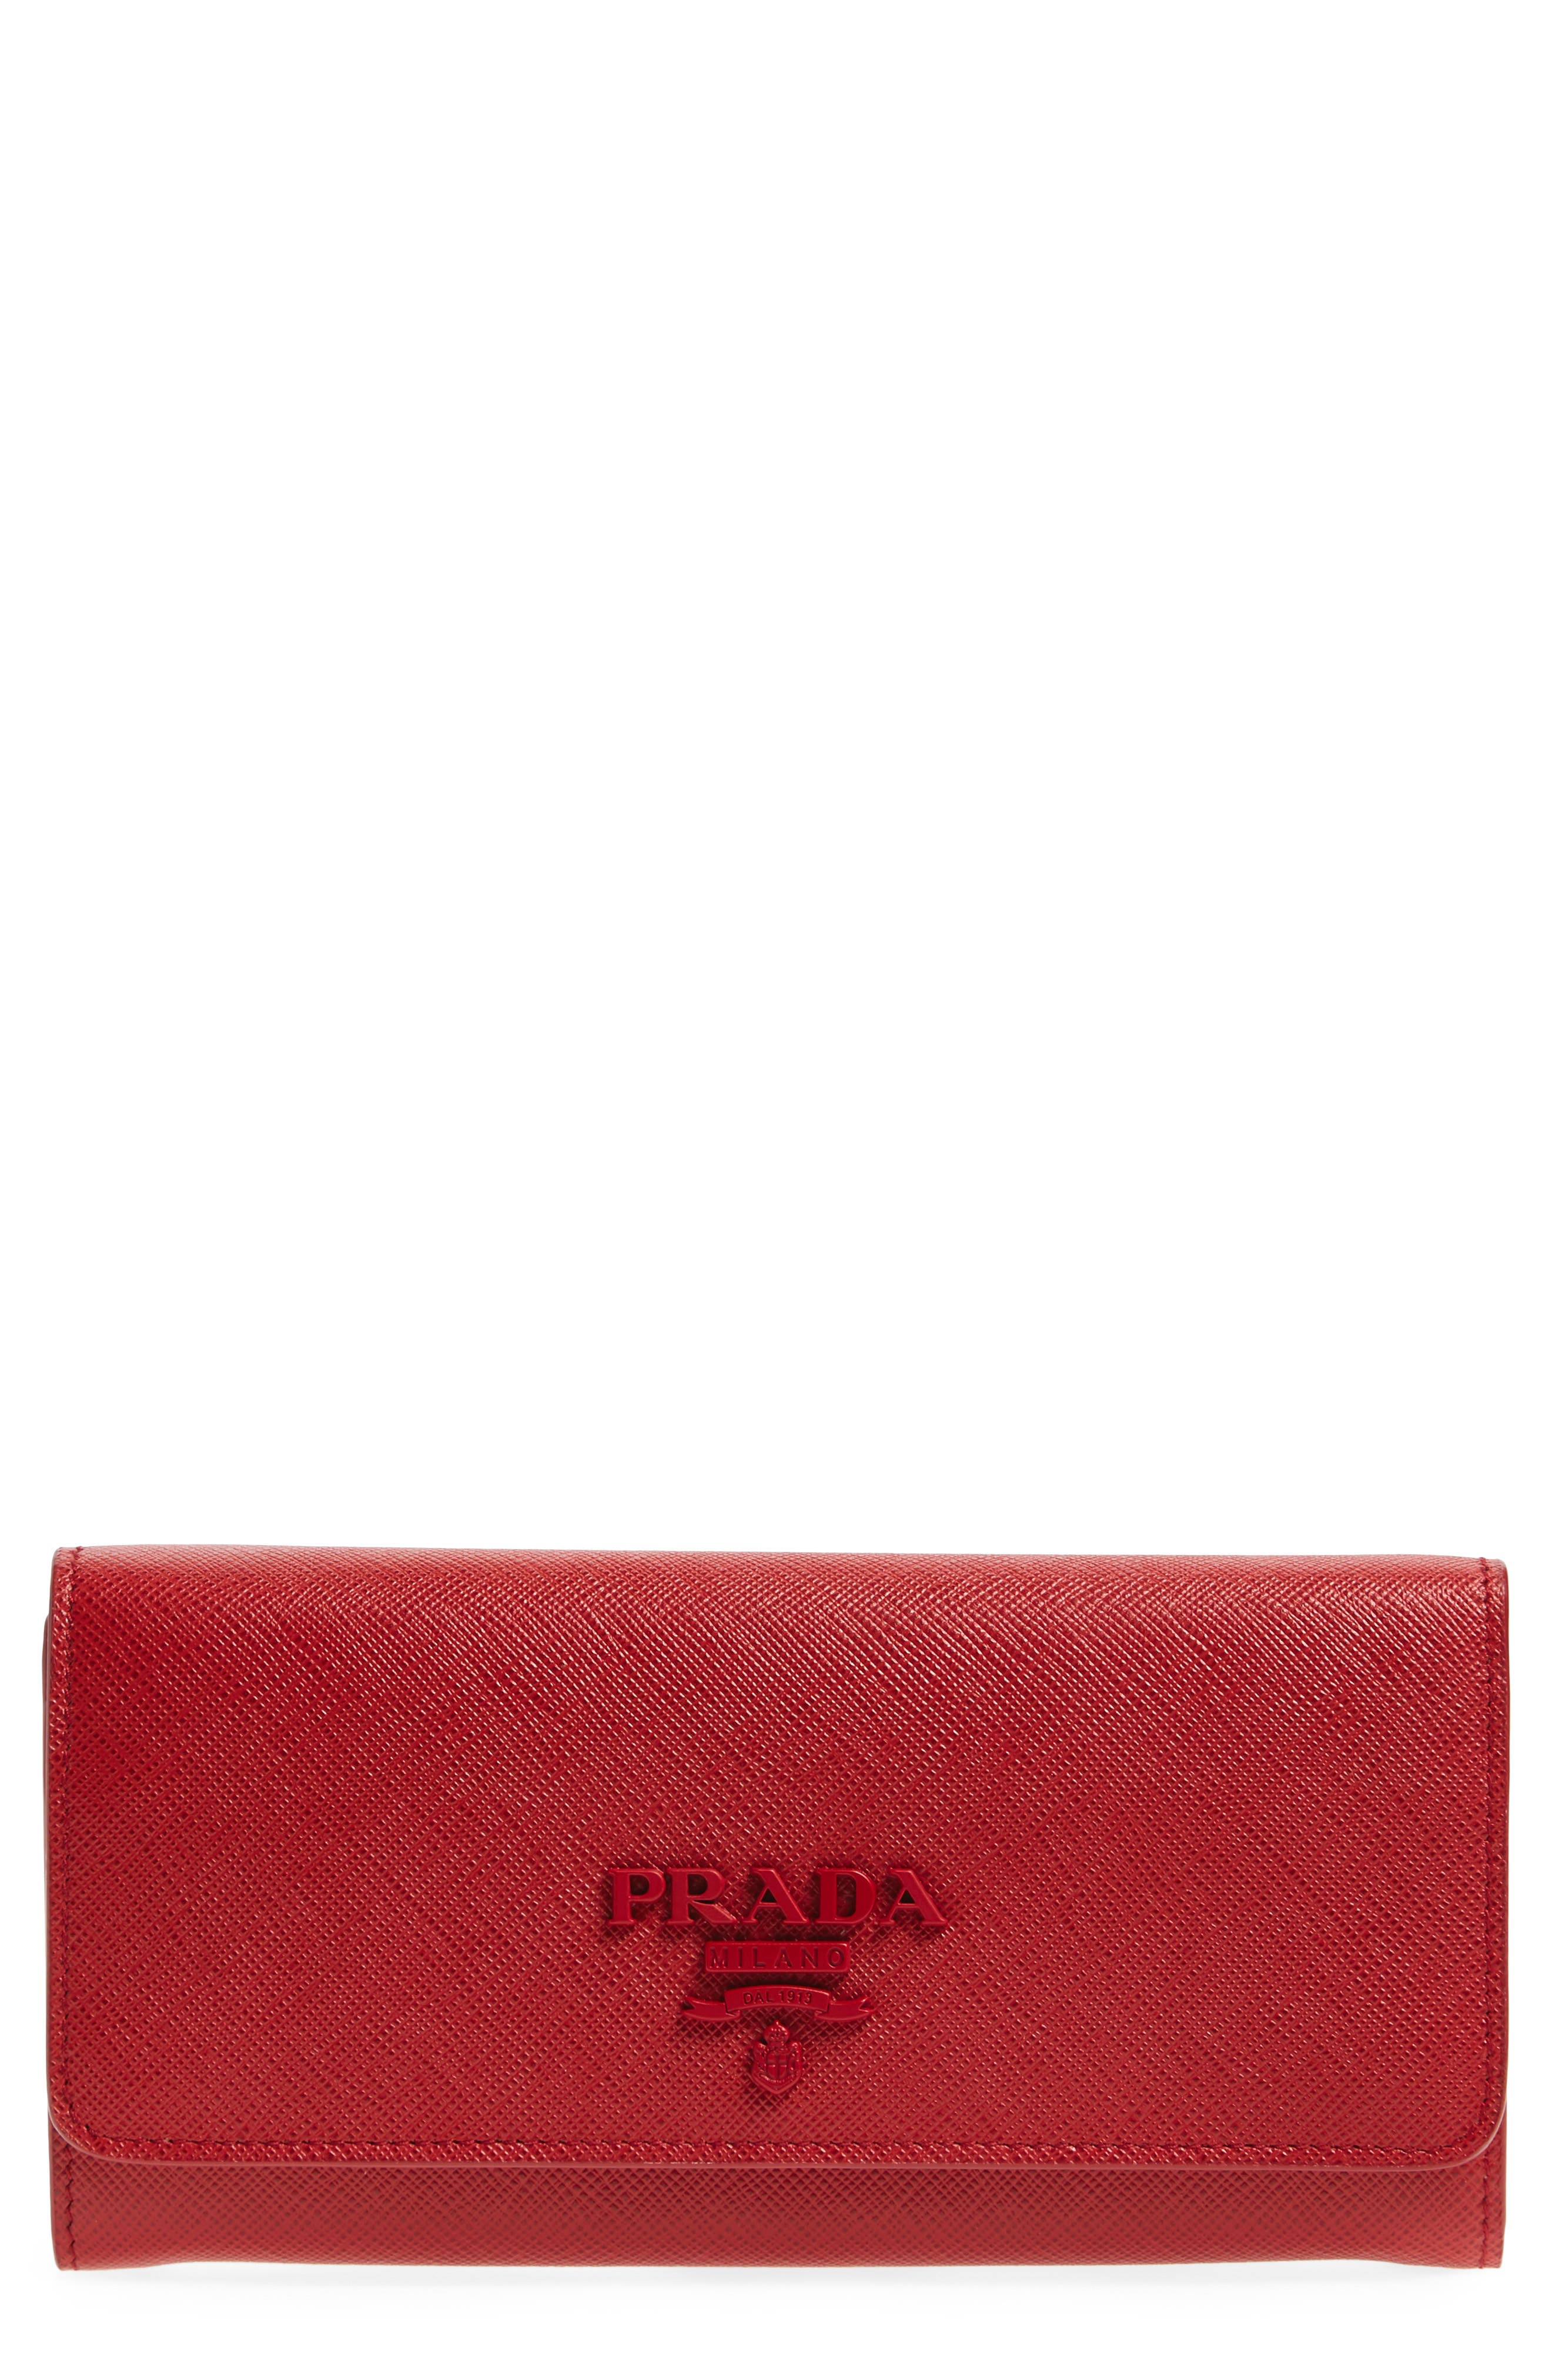 Saffiano Leather Wallet,                             Main thumbnail 2, color,